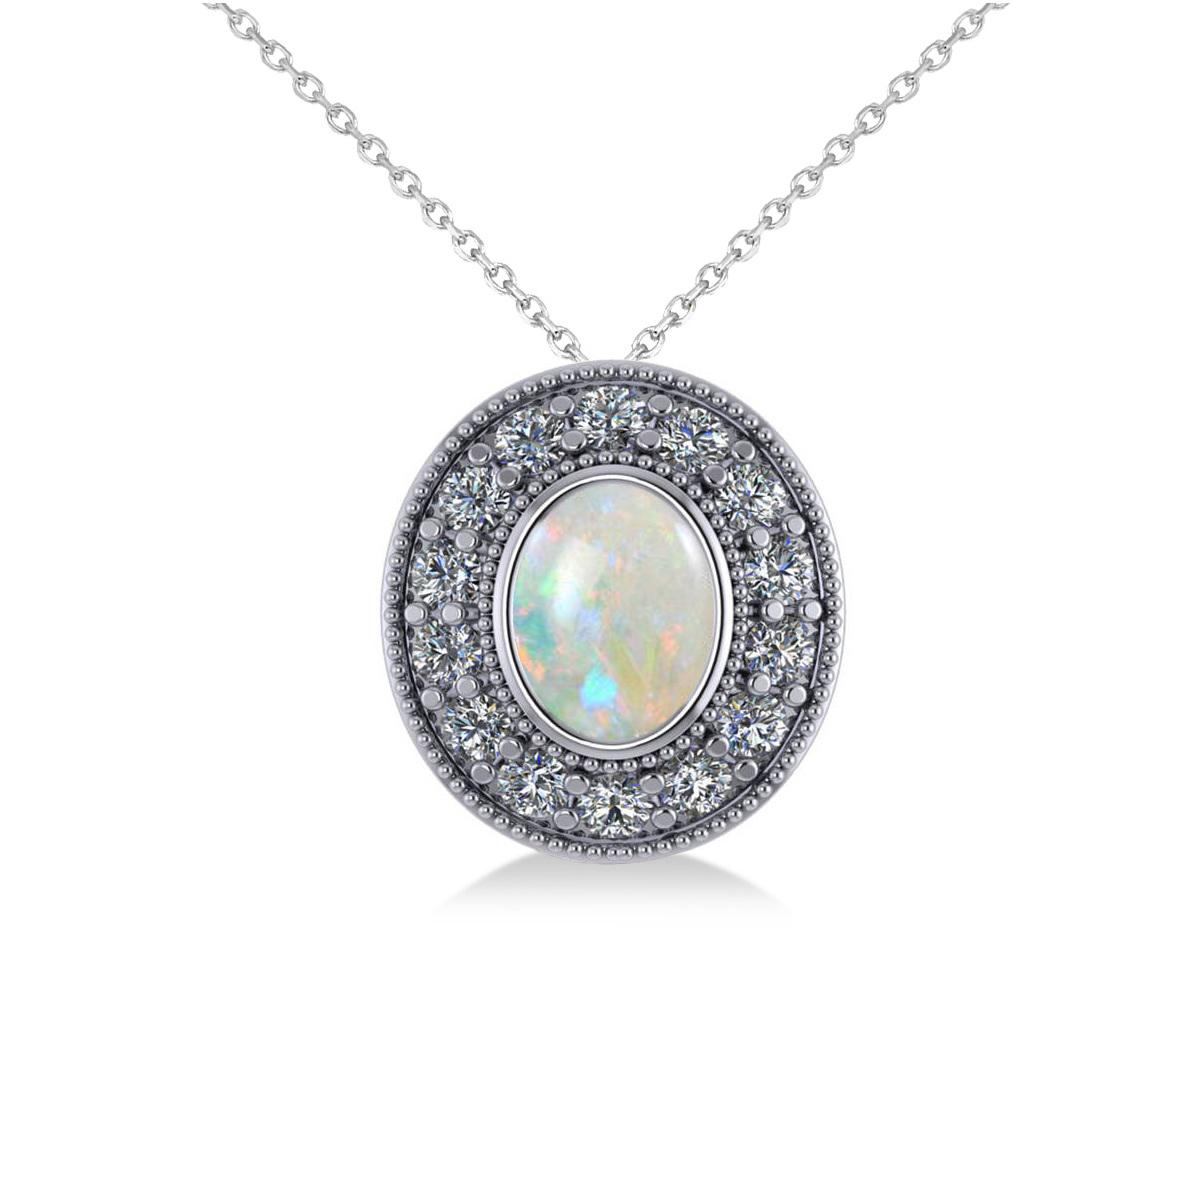 Opal & Diamond Halo Oval Pendant Necklace 14k White Gold (0.89ct)